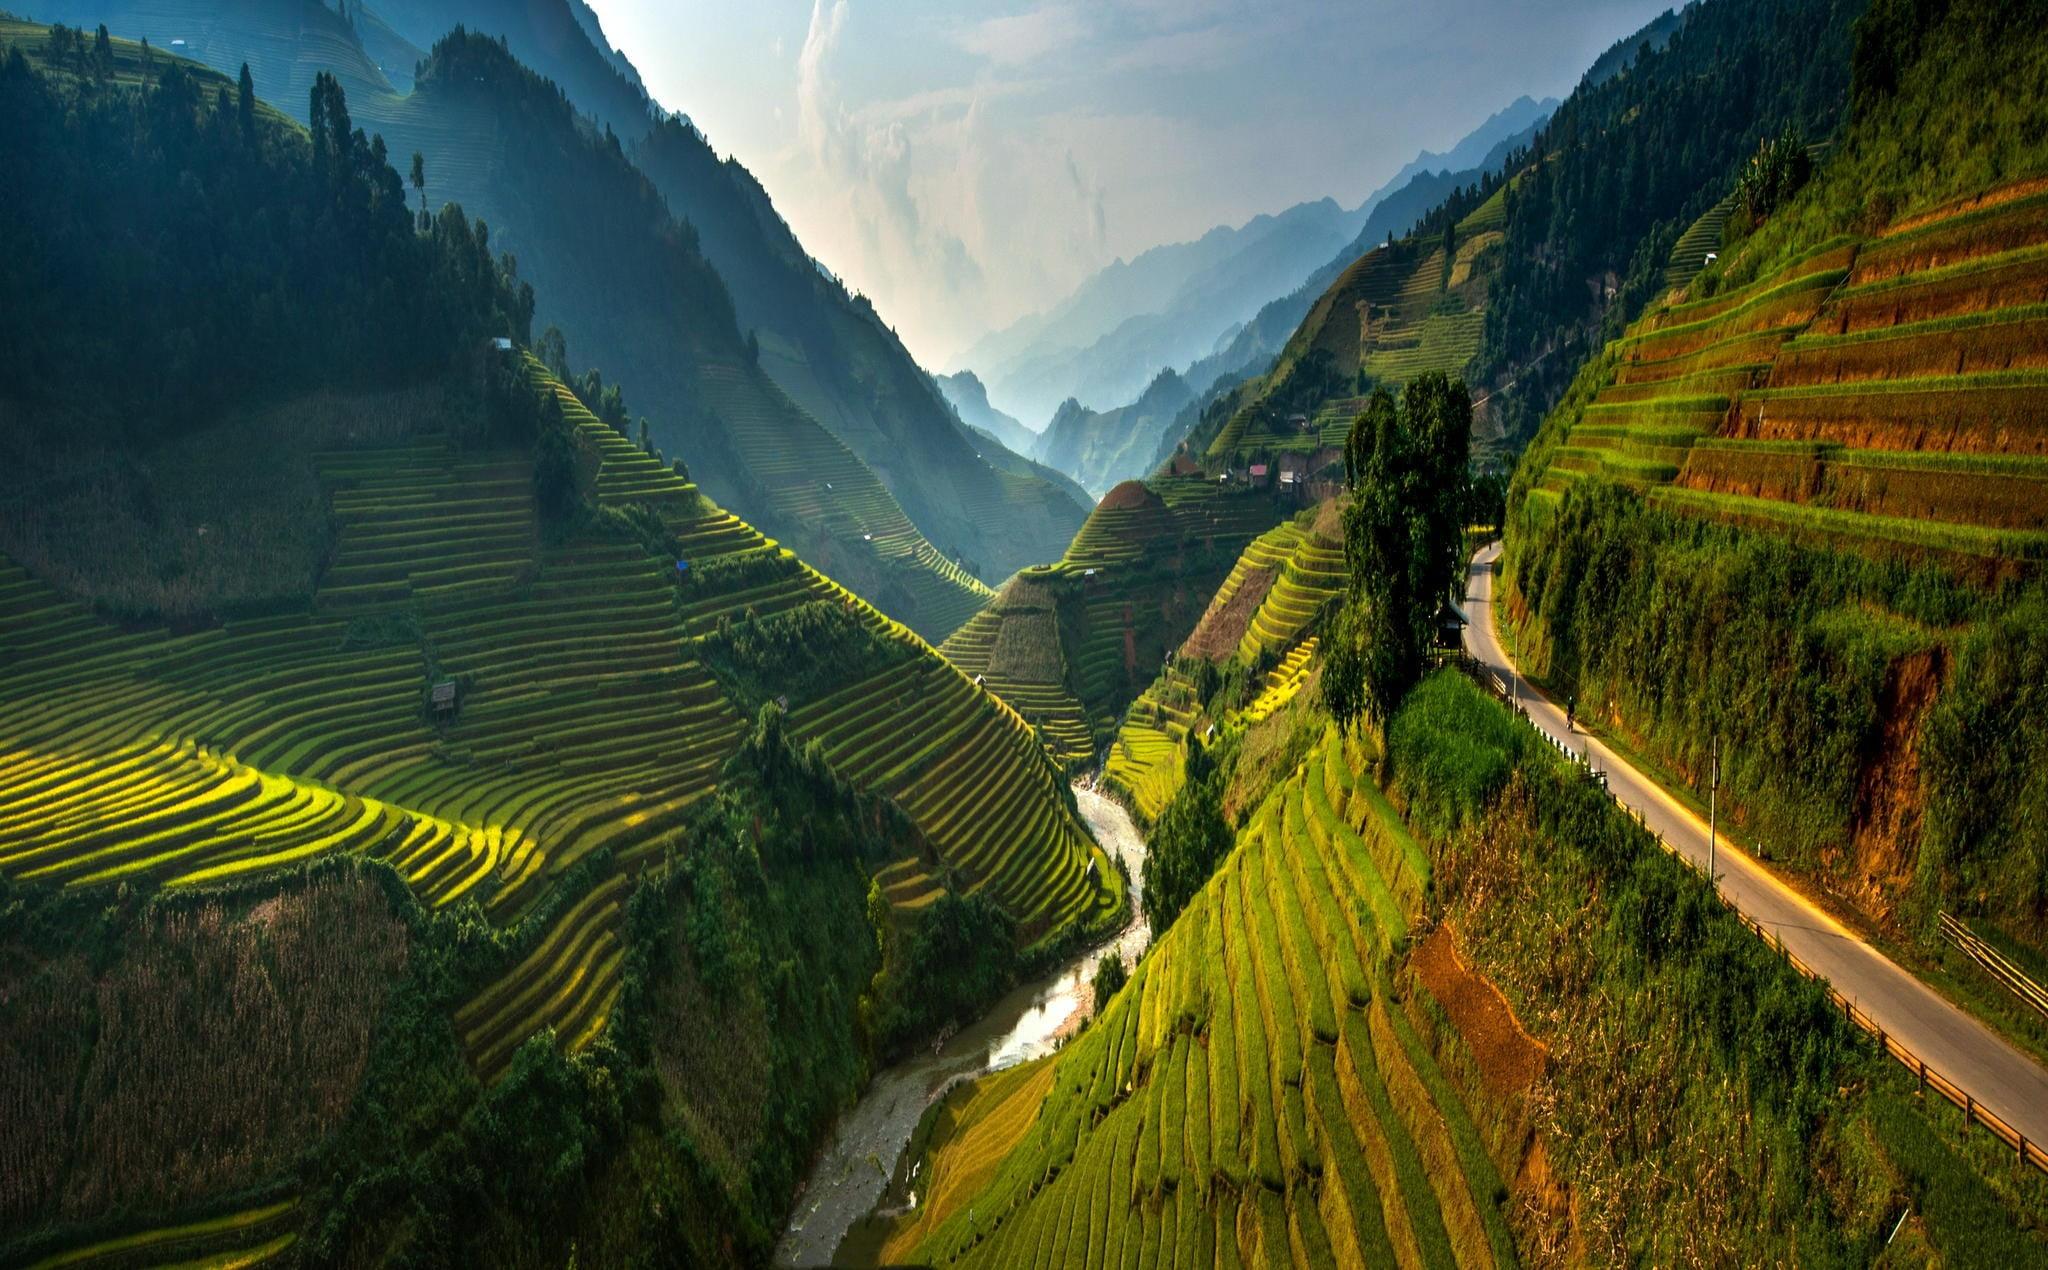 Banaue Rice Terraces, Philippines Hd Wallpaper - Vietnam Landscapes , HD Wallpaper & Backgrounds